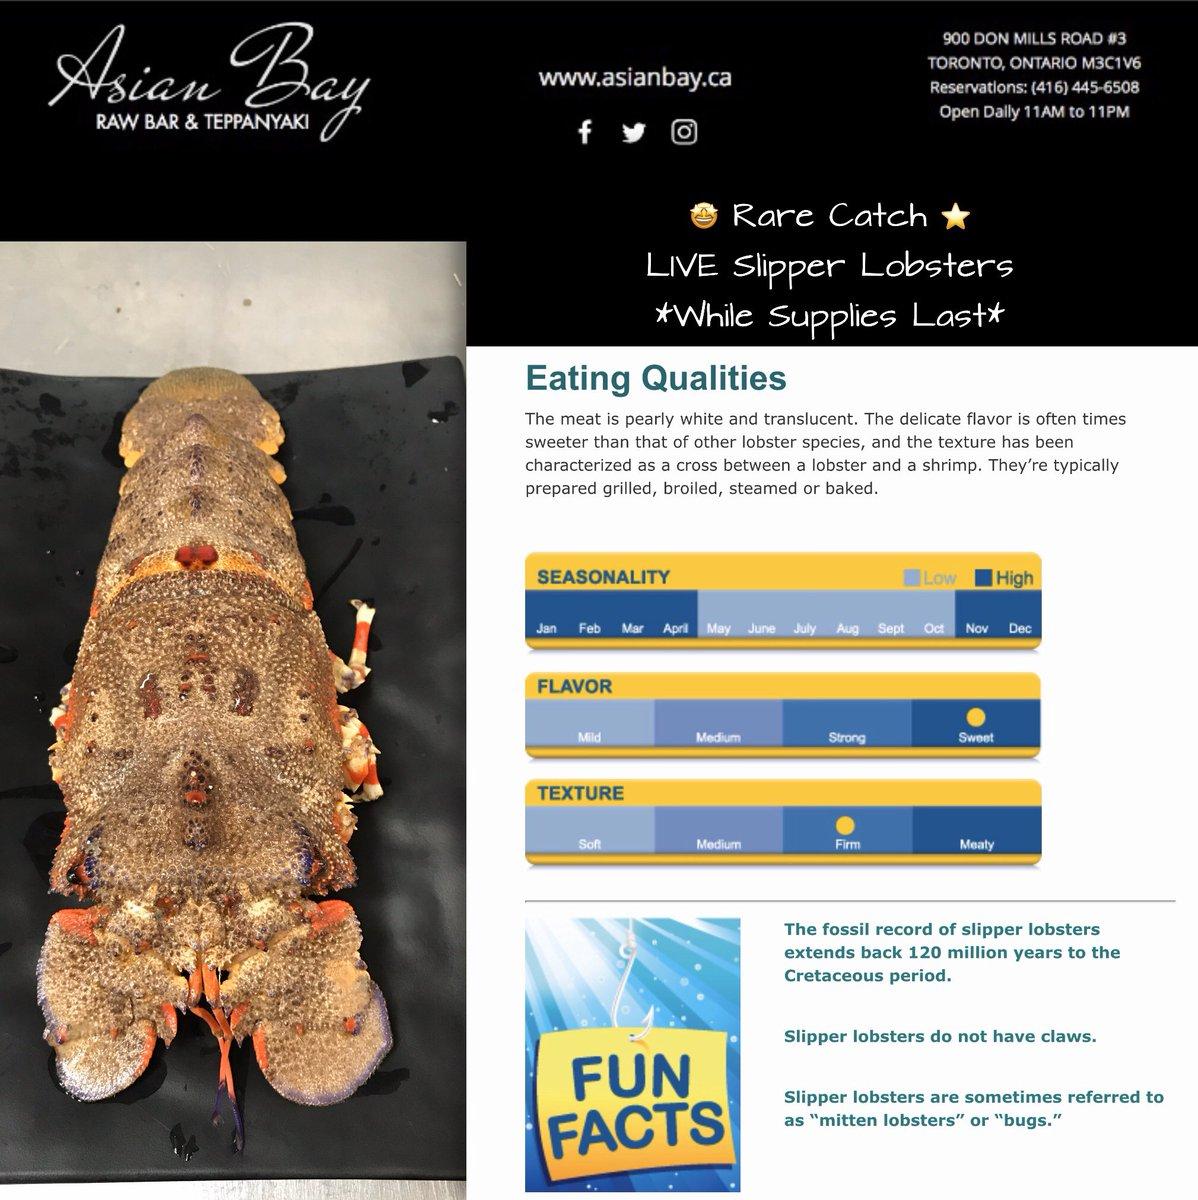 #directimport #lobster #seafoodtoronto #shellfishtoronto #toronto #seafoodtime #cateringtoronto #lobster#yyz#food #instalobster #instaseafood #seafoodlover #seafoodporn #freshfromthesea #torontocanada #GTA #wholesale #retail #torontorestaurant #seafoodlovers #foodservice #chef https://twitter.com/asianbay_ca/status/1216123926046289920…